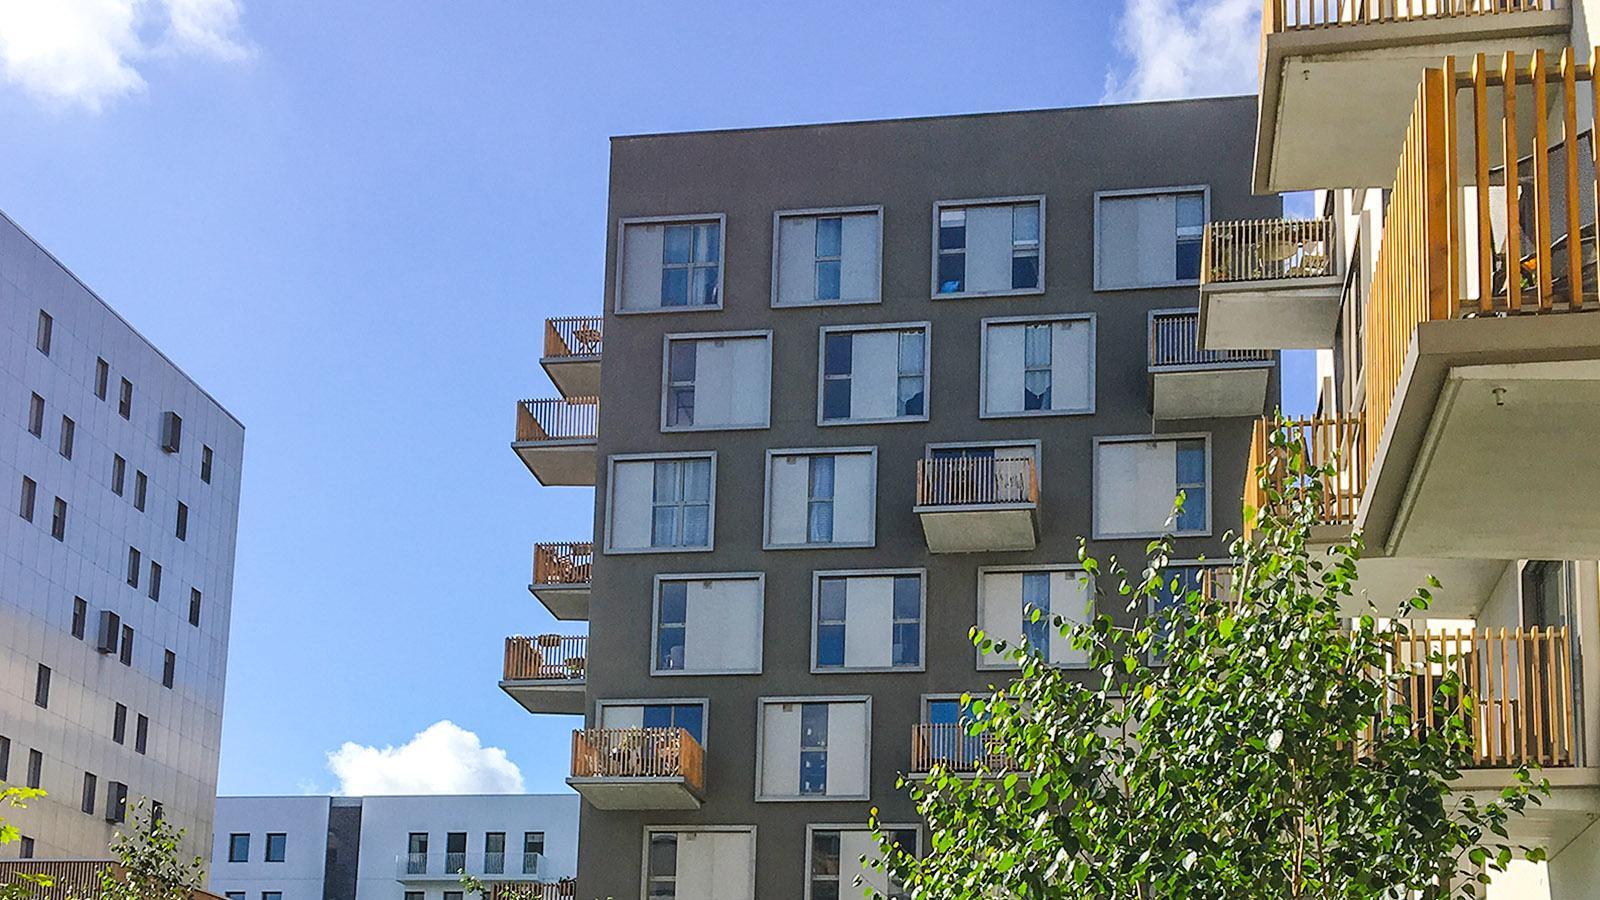 Île de Nantes: Neubau-Wohnungen. Foto: Hilke Maunder